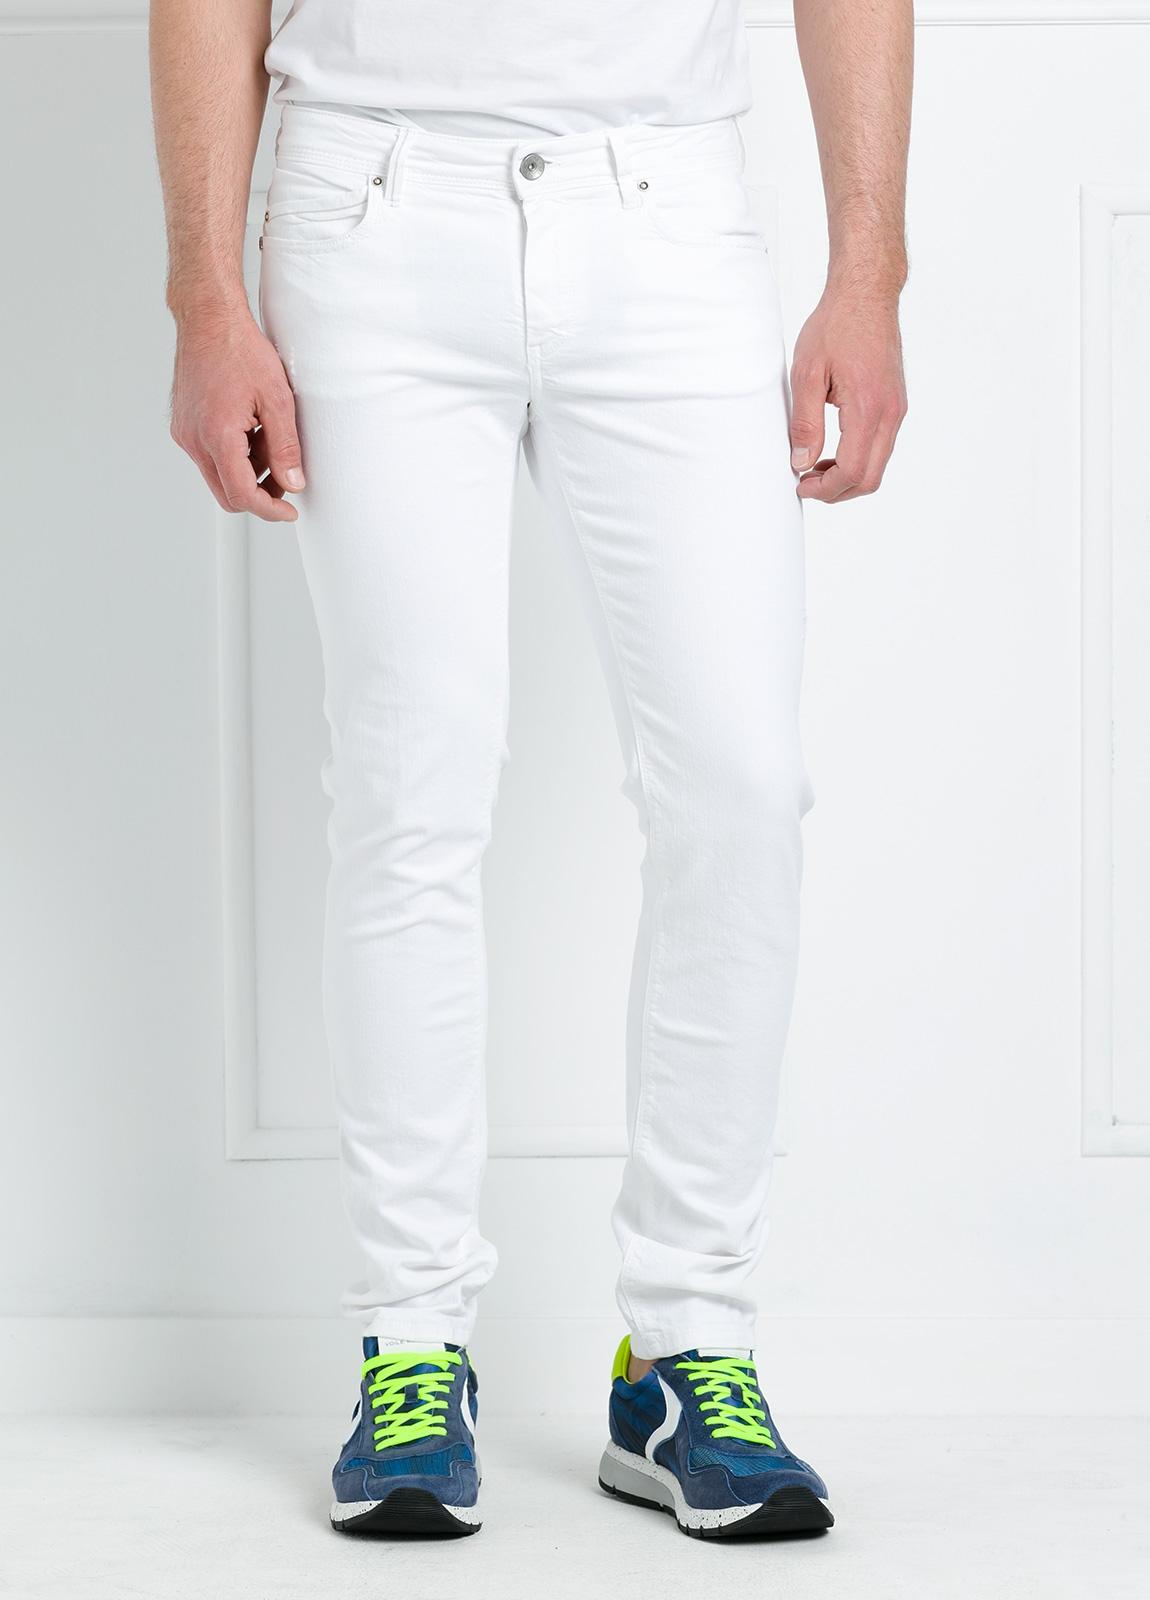 Pantalón sport regular fit modelo RUPENS Z P015 color blanco. Algodón denim. - Ítem1